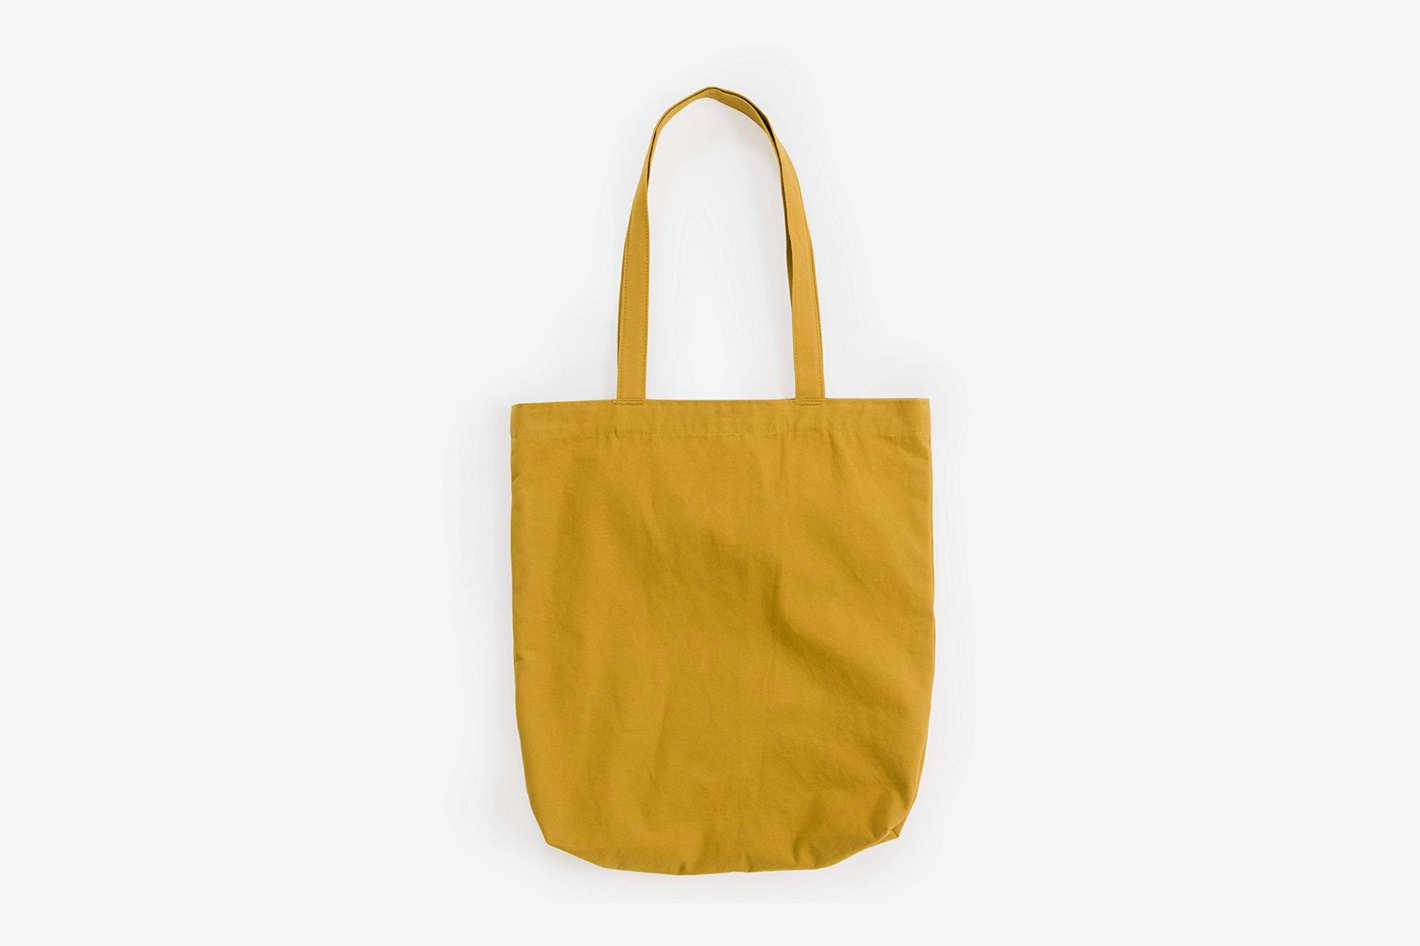 BAGGU Merch Tote, Simple and Easy Canvas Tote Bag